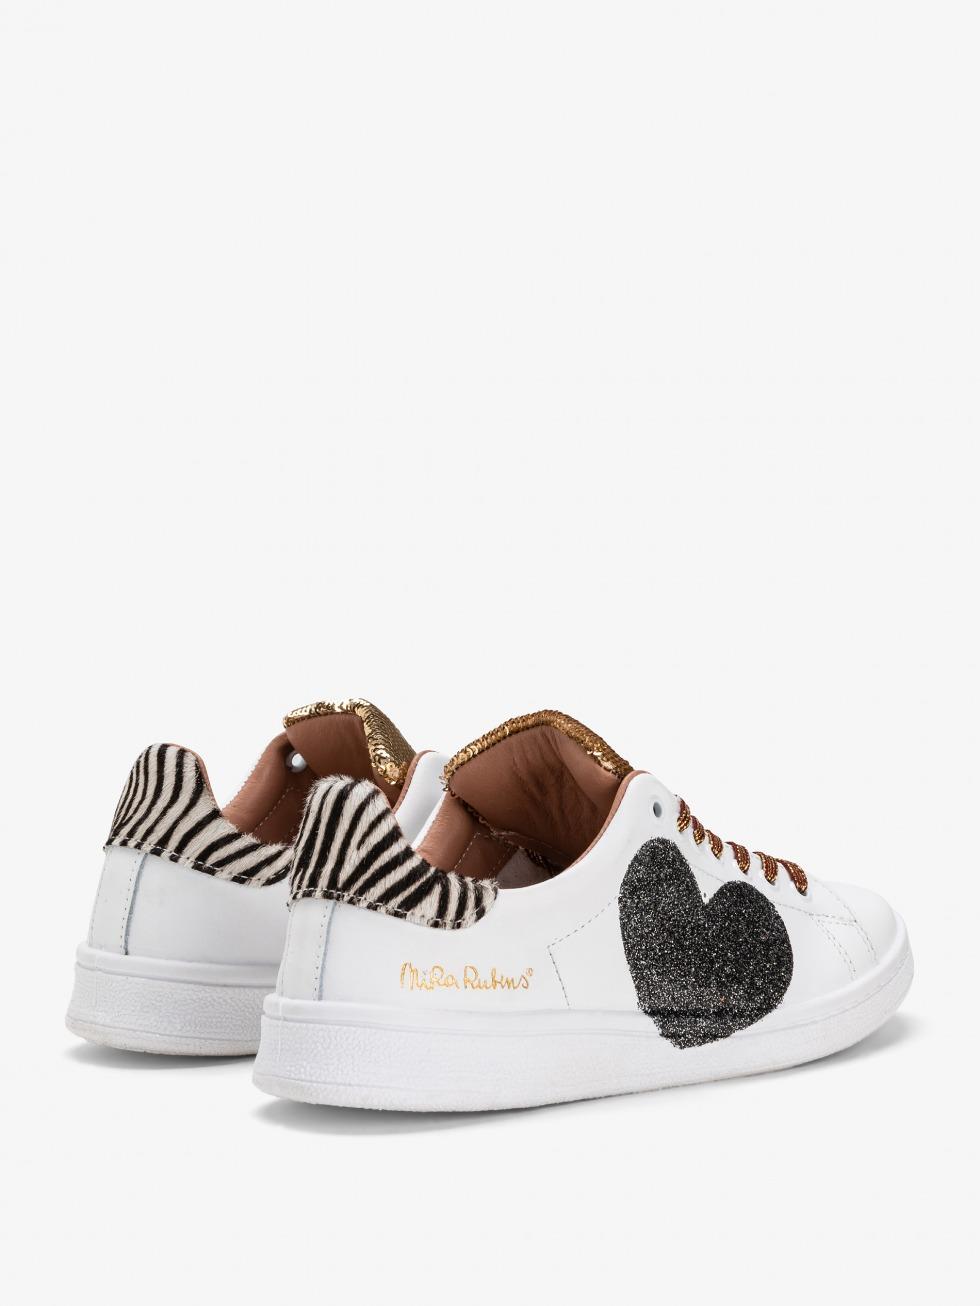 Daiquiri Gold Mini Zebrina Sneakers - Sparkle Heart